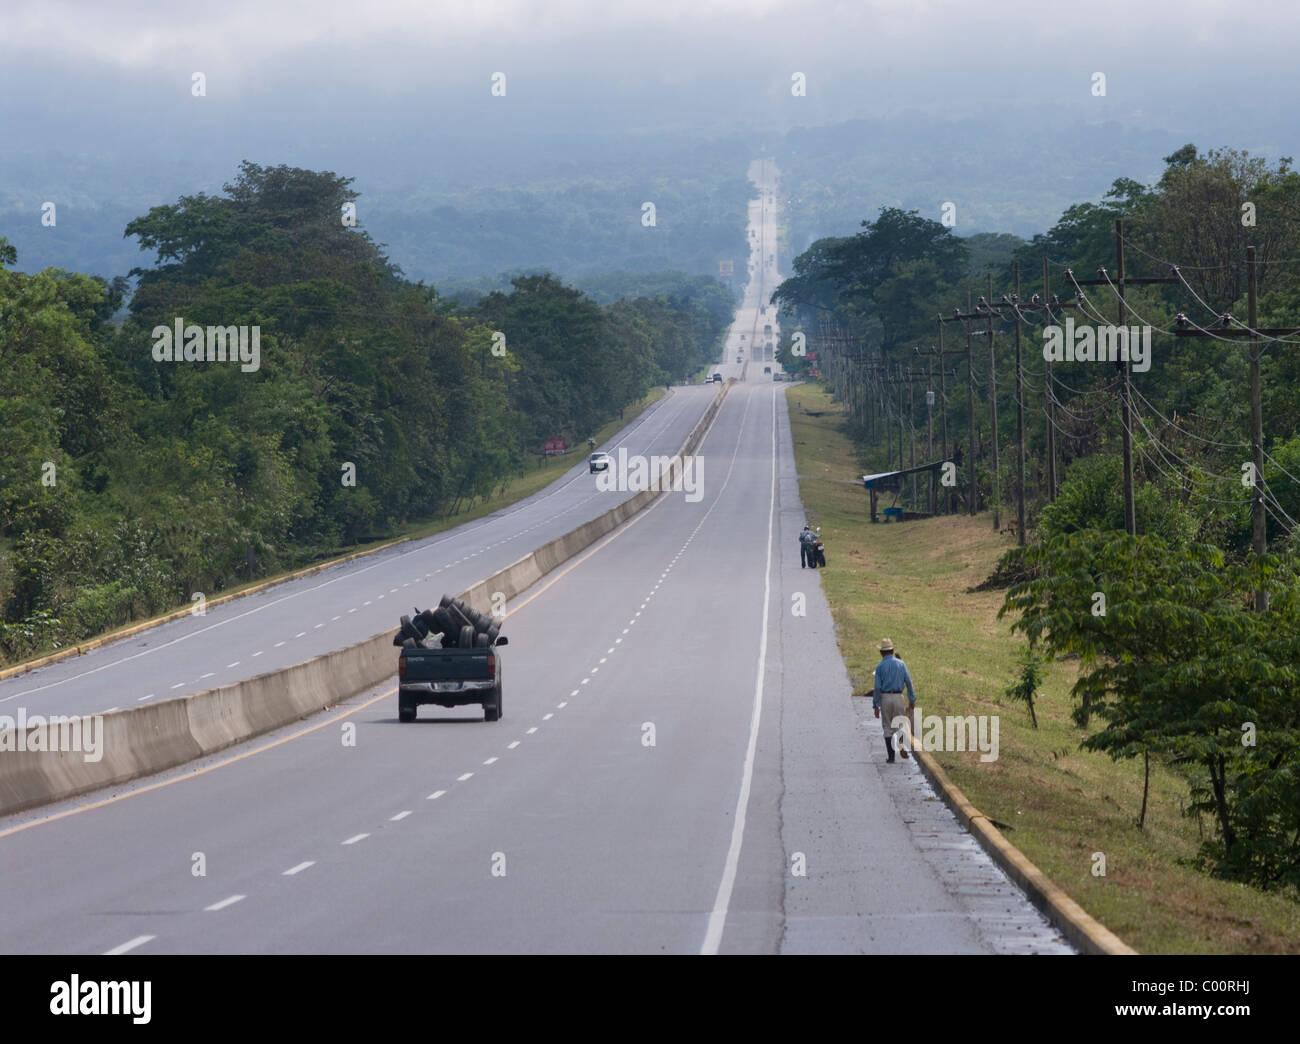 Honduras.Departament of Comayagua. Main paved road. - Stock Image